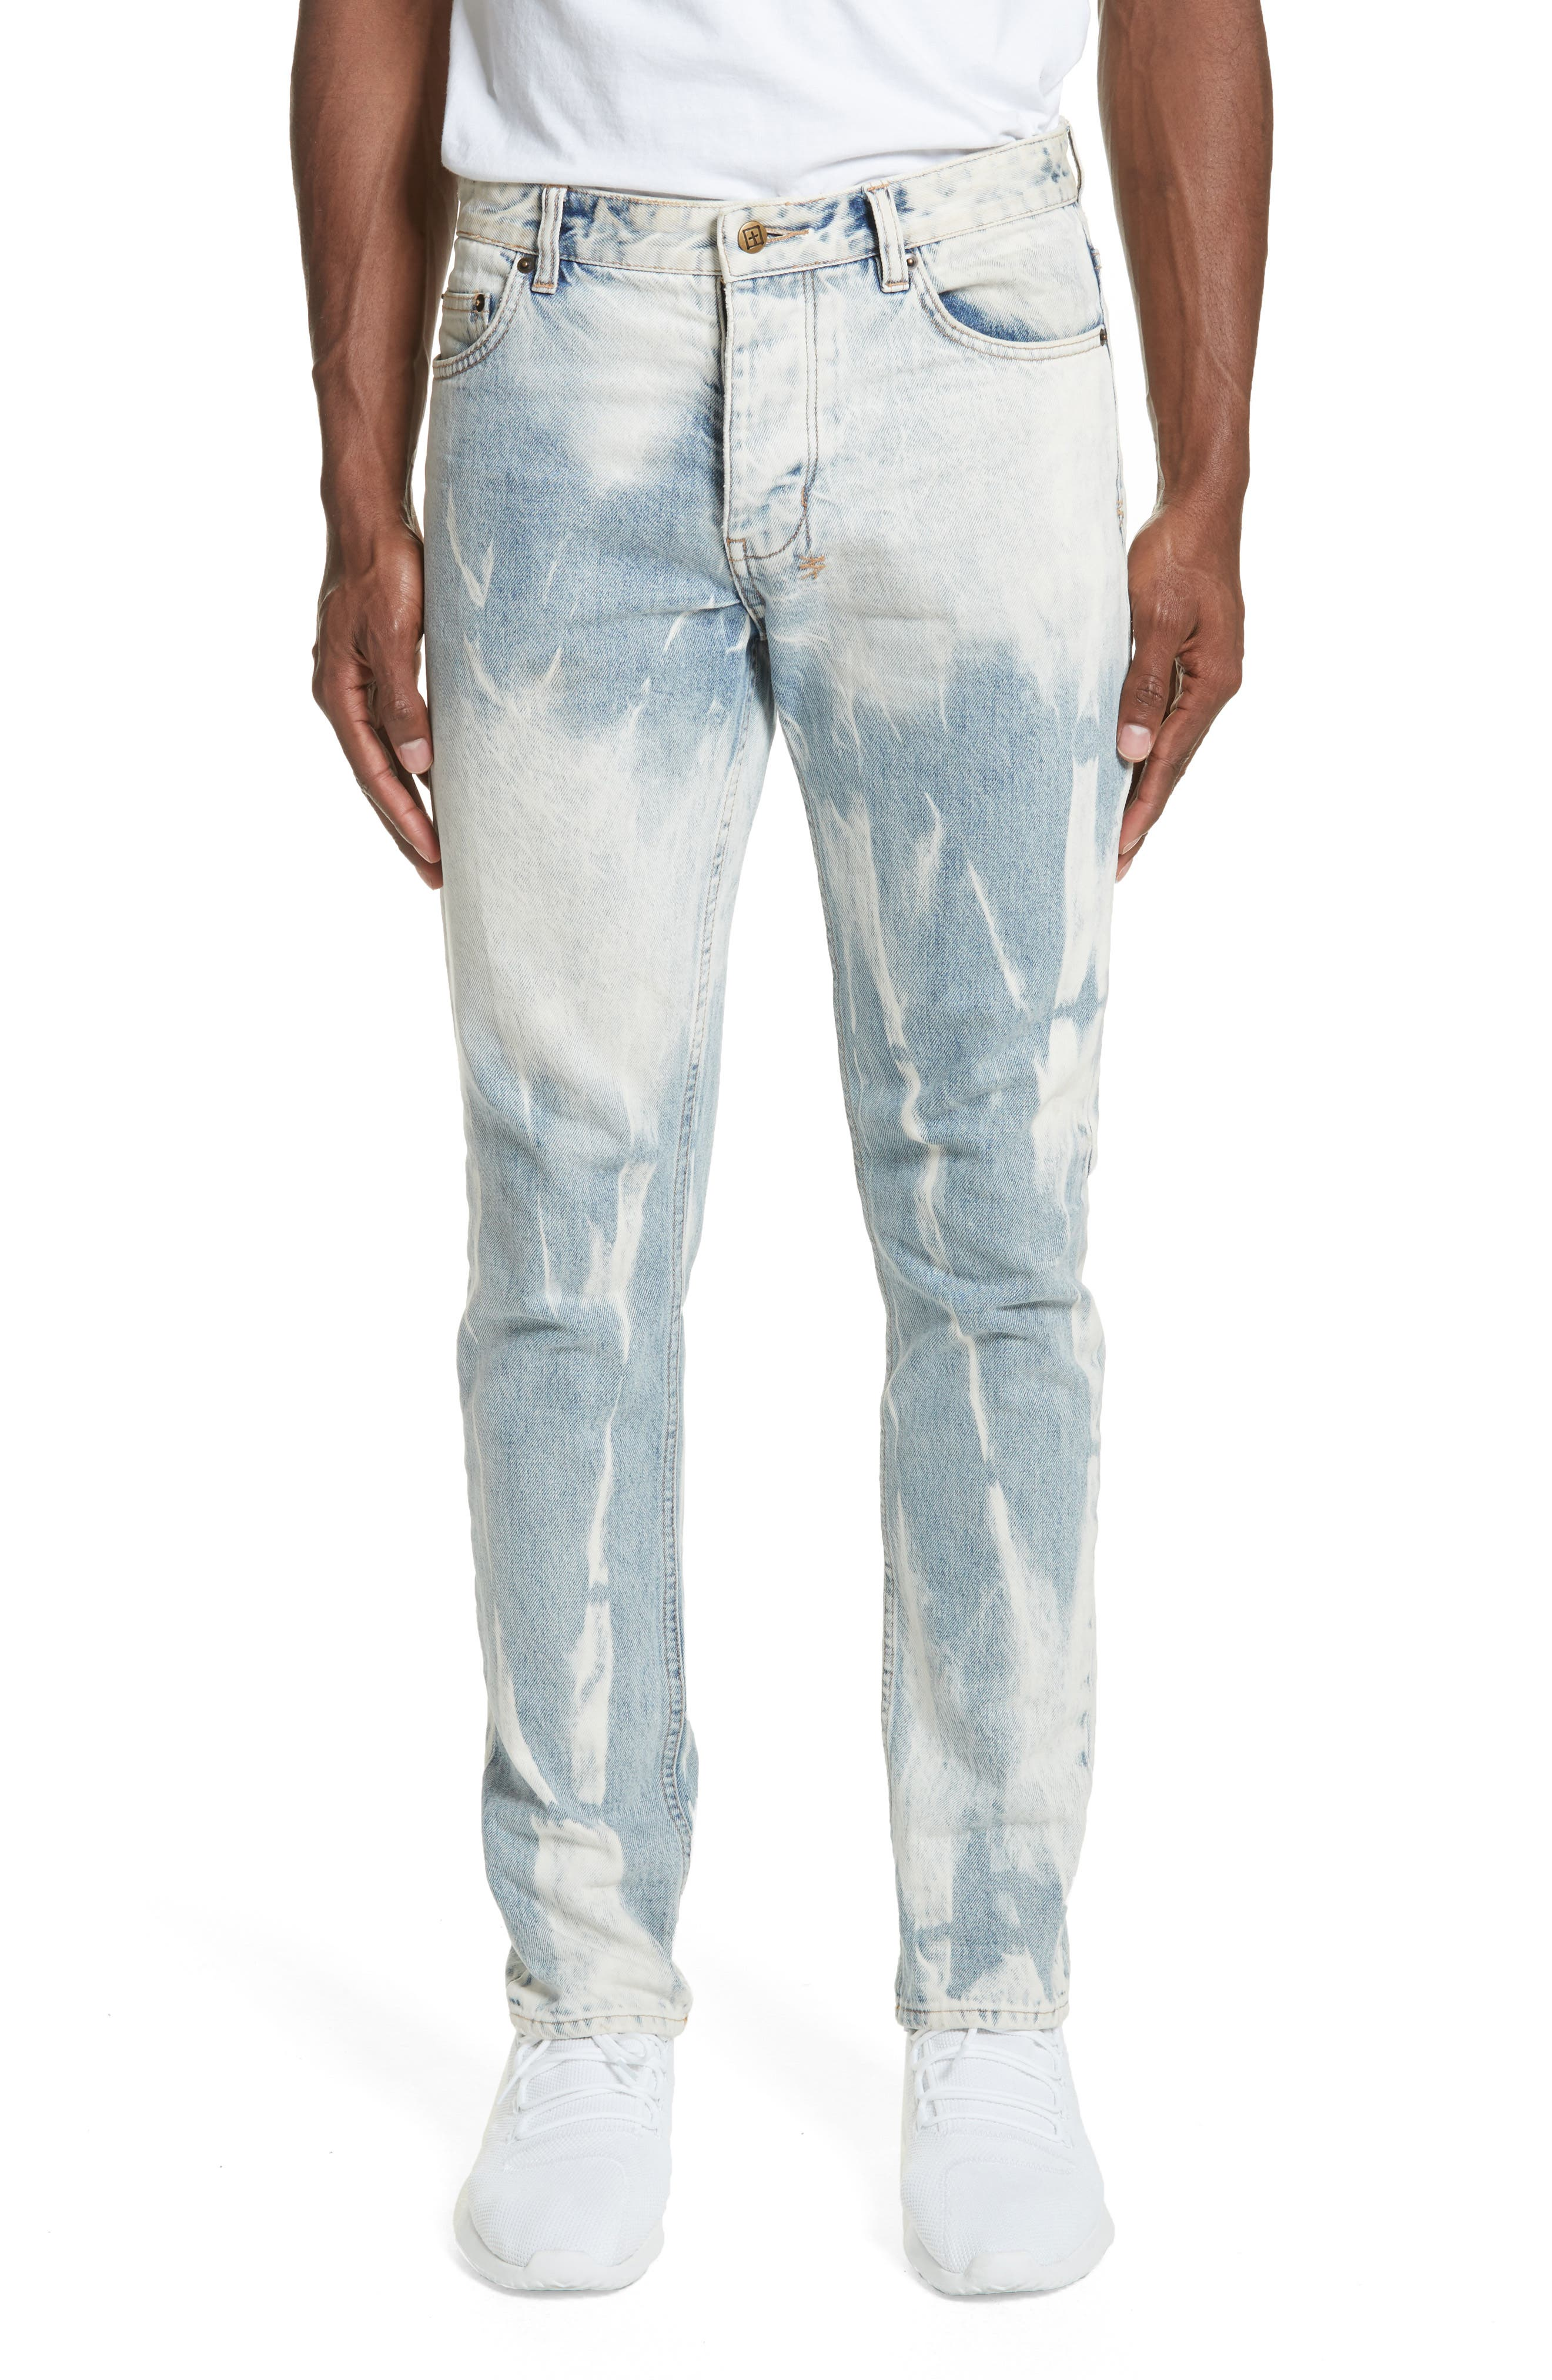 Chitch Mile Skinny Jeans,                         Main,                         color, Denim